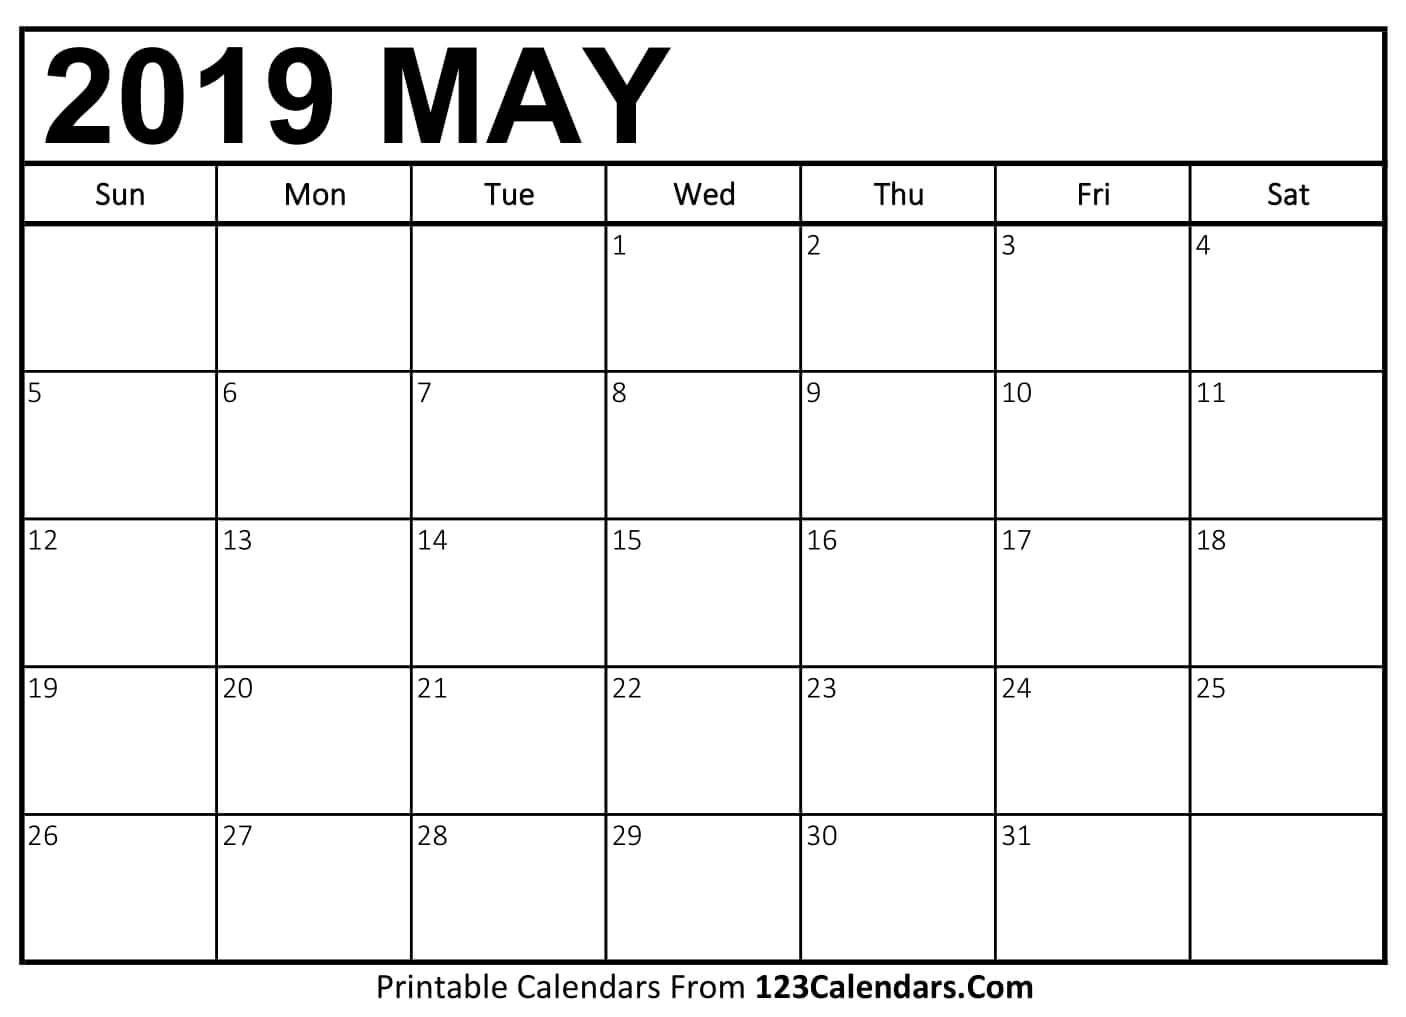 Printable May 2019 Calendar Templates - 123Calendars Calendar Of 2019 May